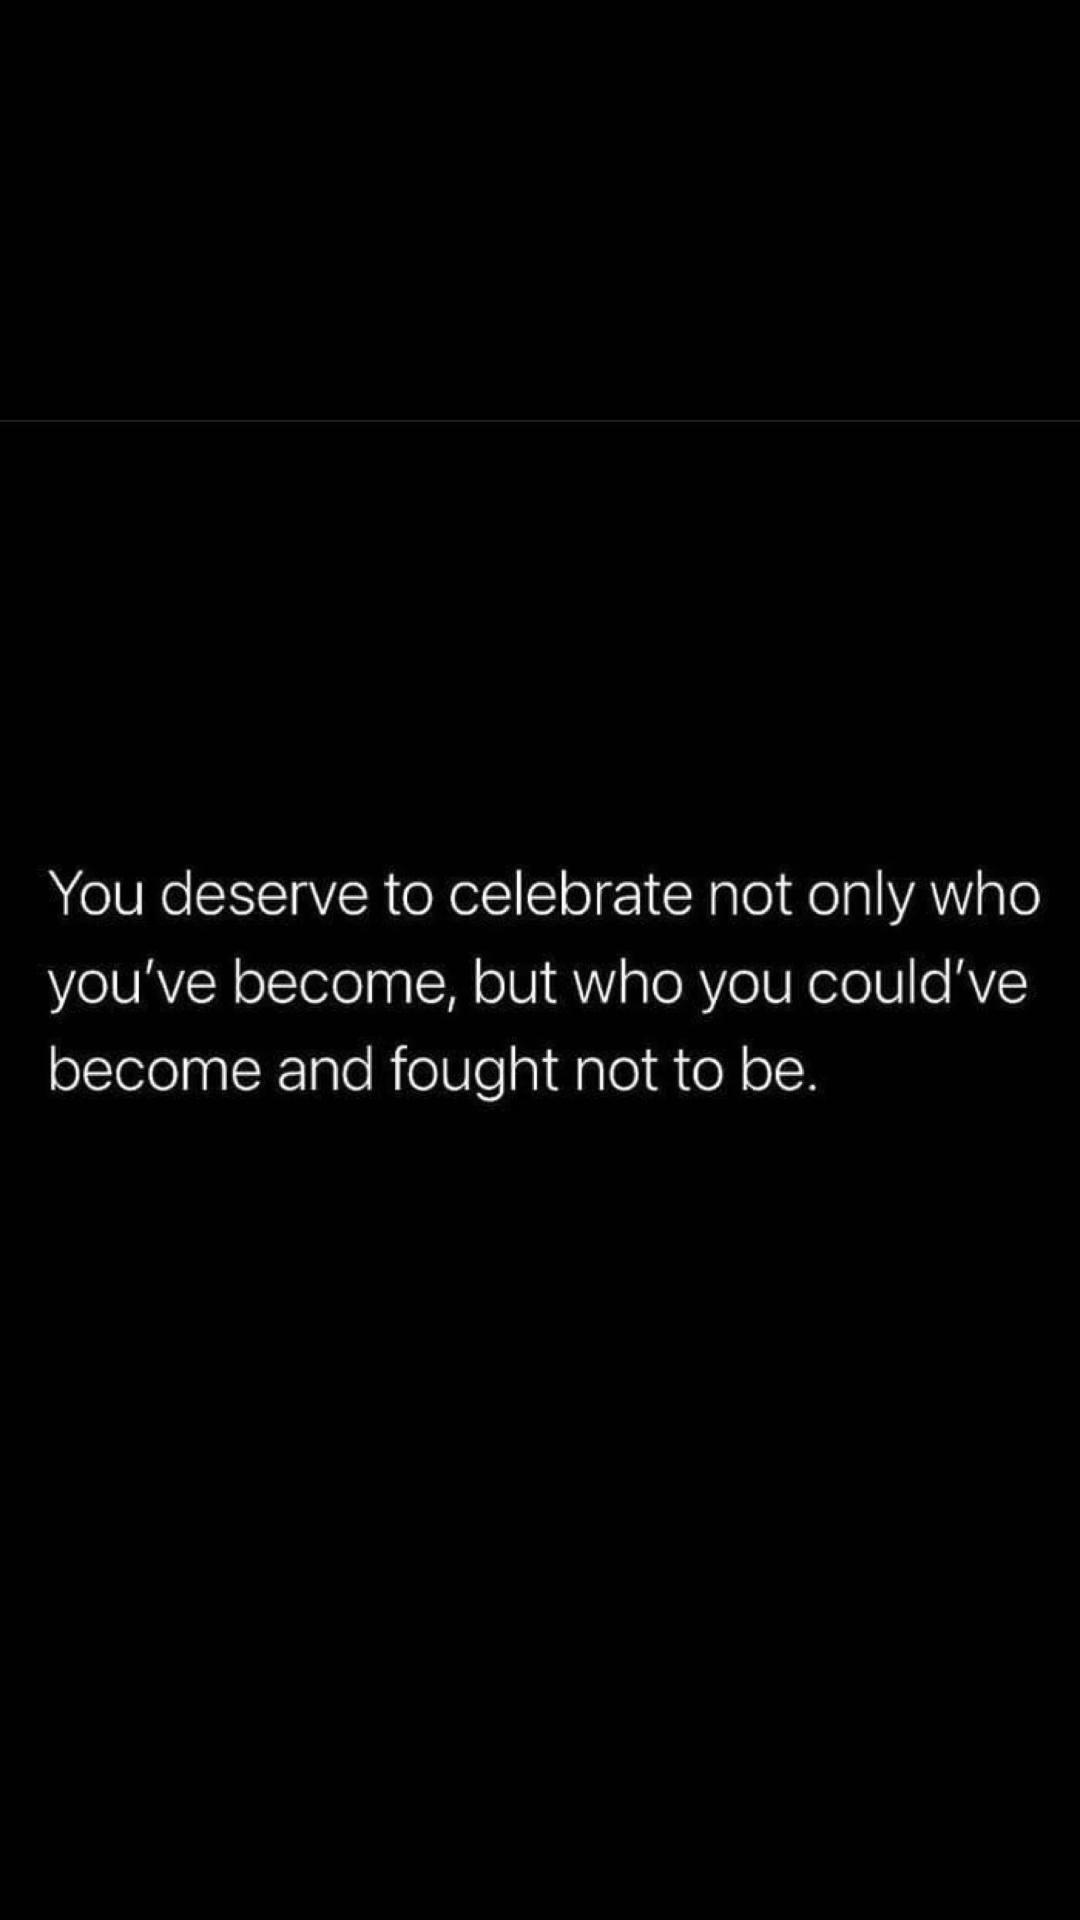 Uplifting and encouraging words! 💜 #motivation #upliftingwords #encouragement